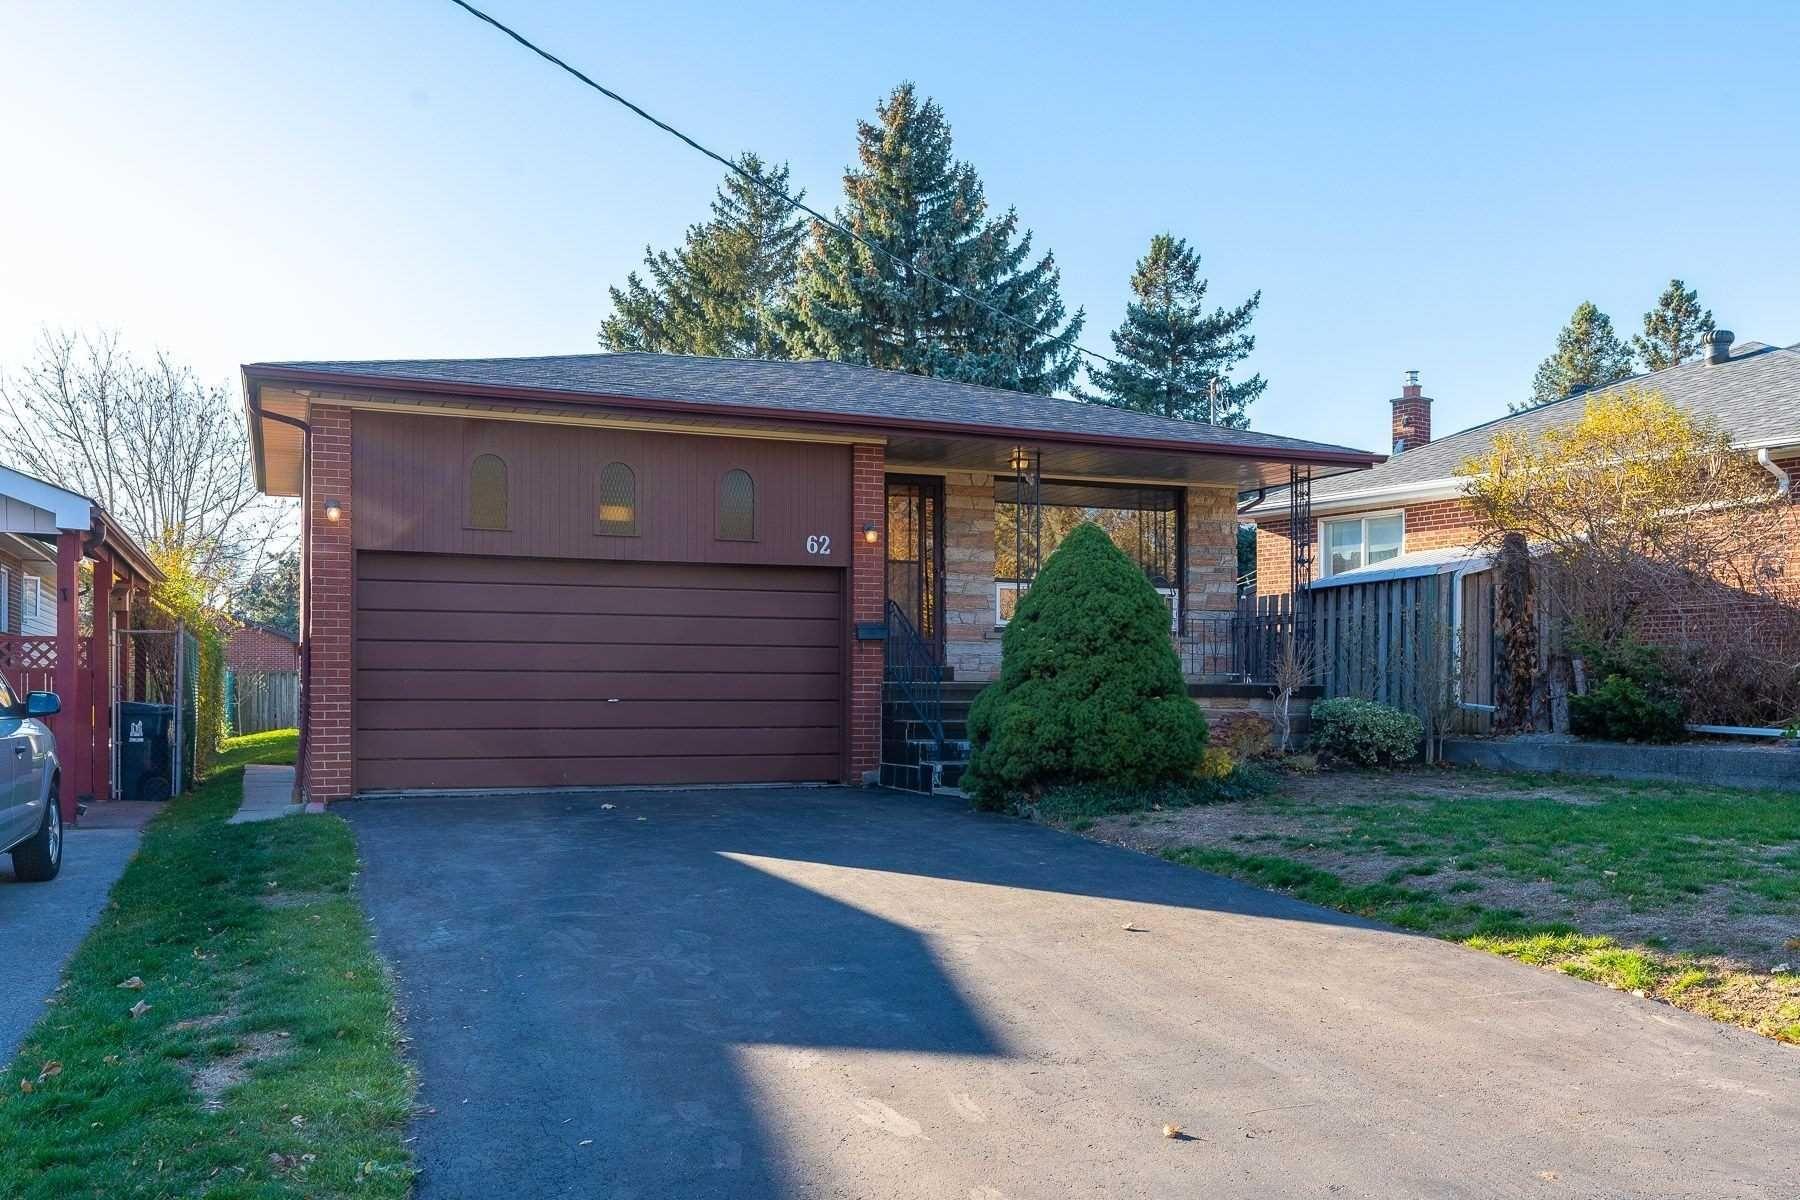 Main Photo: 62 Edmonton Road in Toronto: Pleasant View House (Bungalow) for sale (Toronto C15)  : MLS®# C4991814